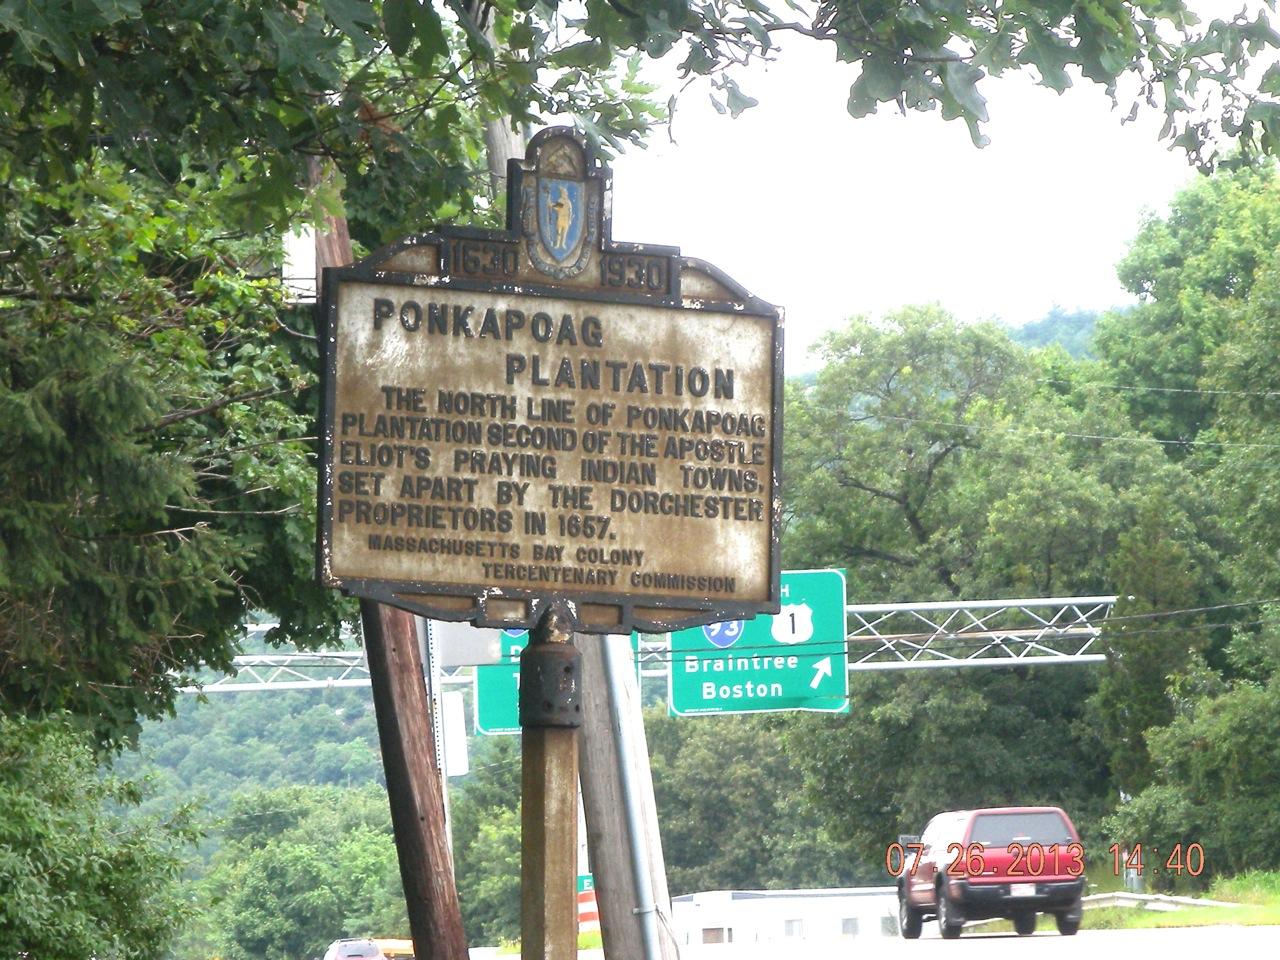 Ponkapoag Plantation